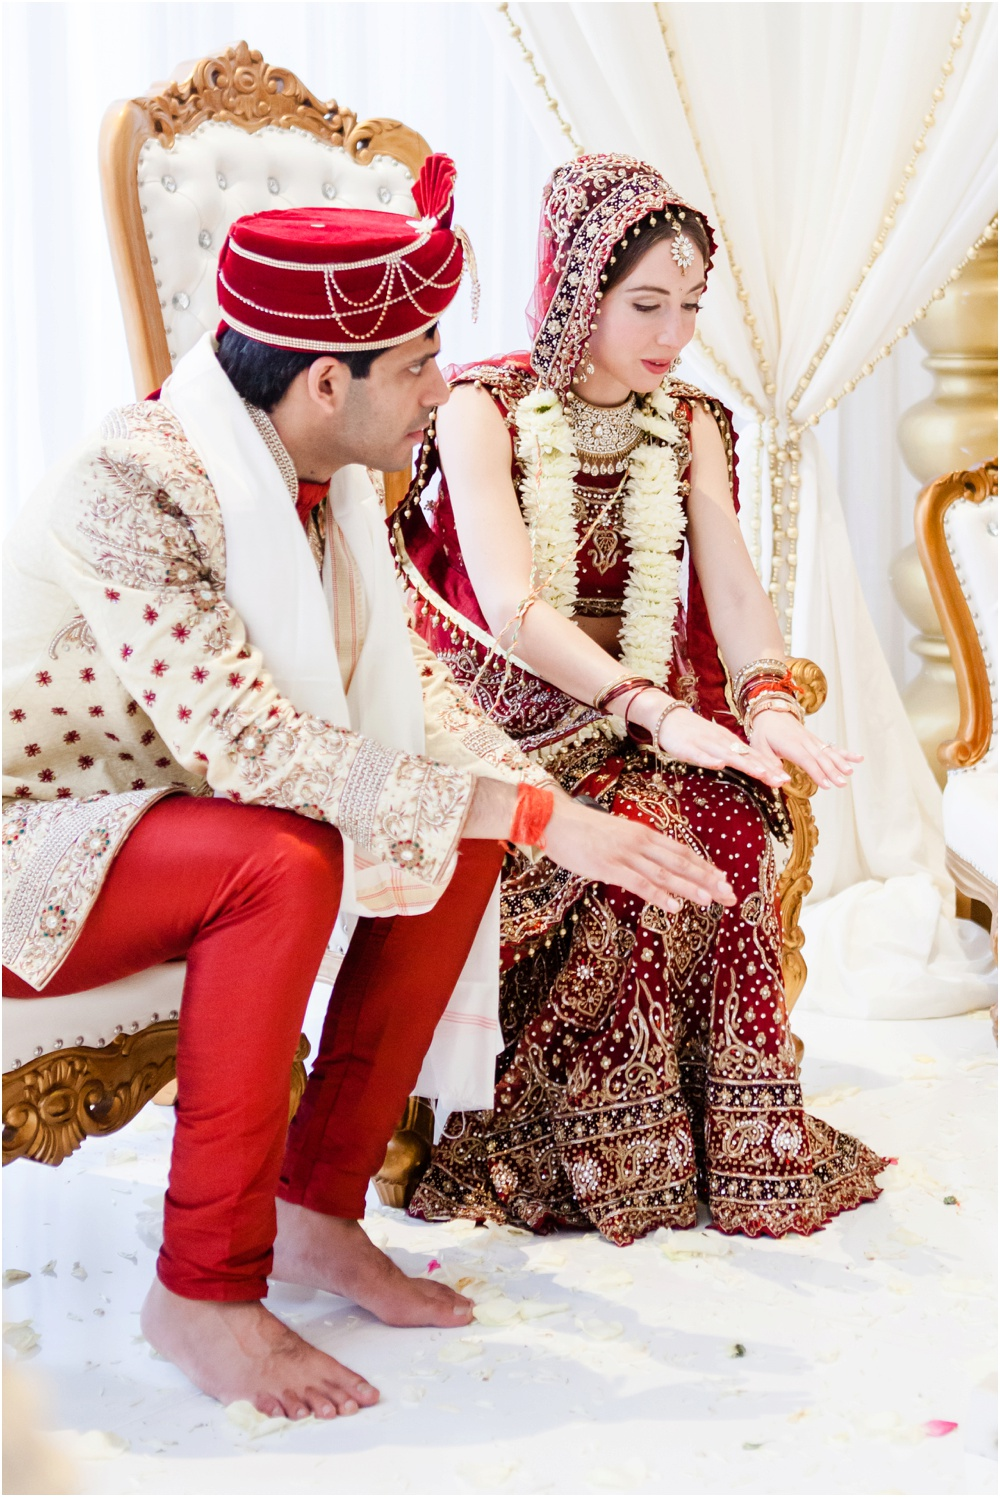 RI-Wedding-Photographer-Lefebvre-Photo-Blog_2899.jpg